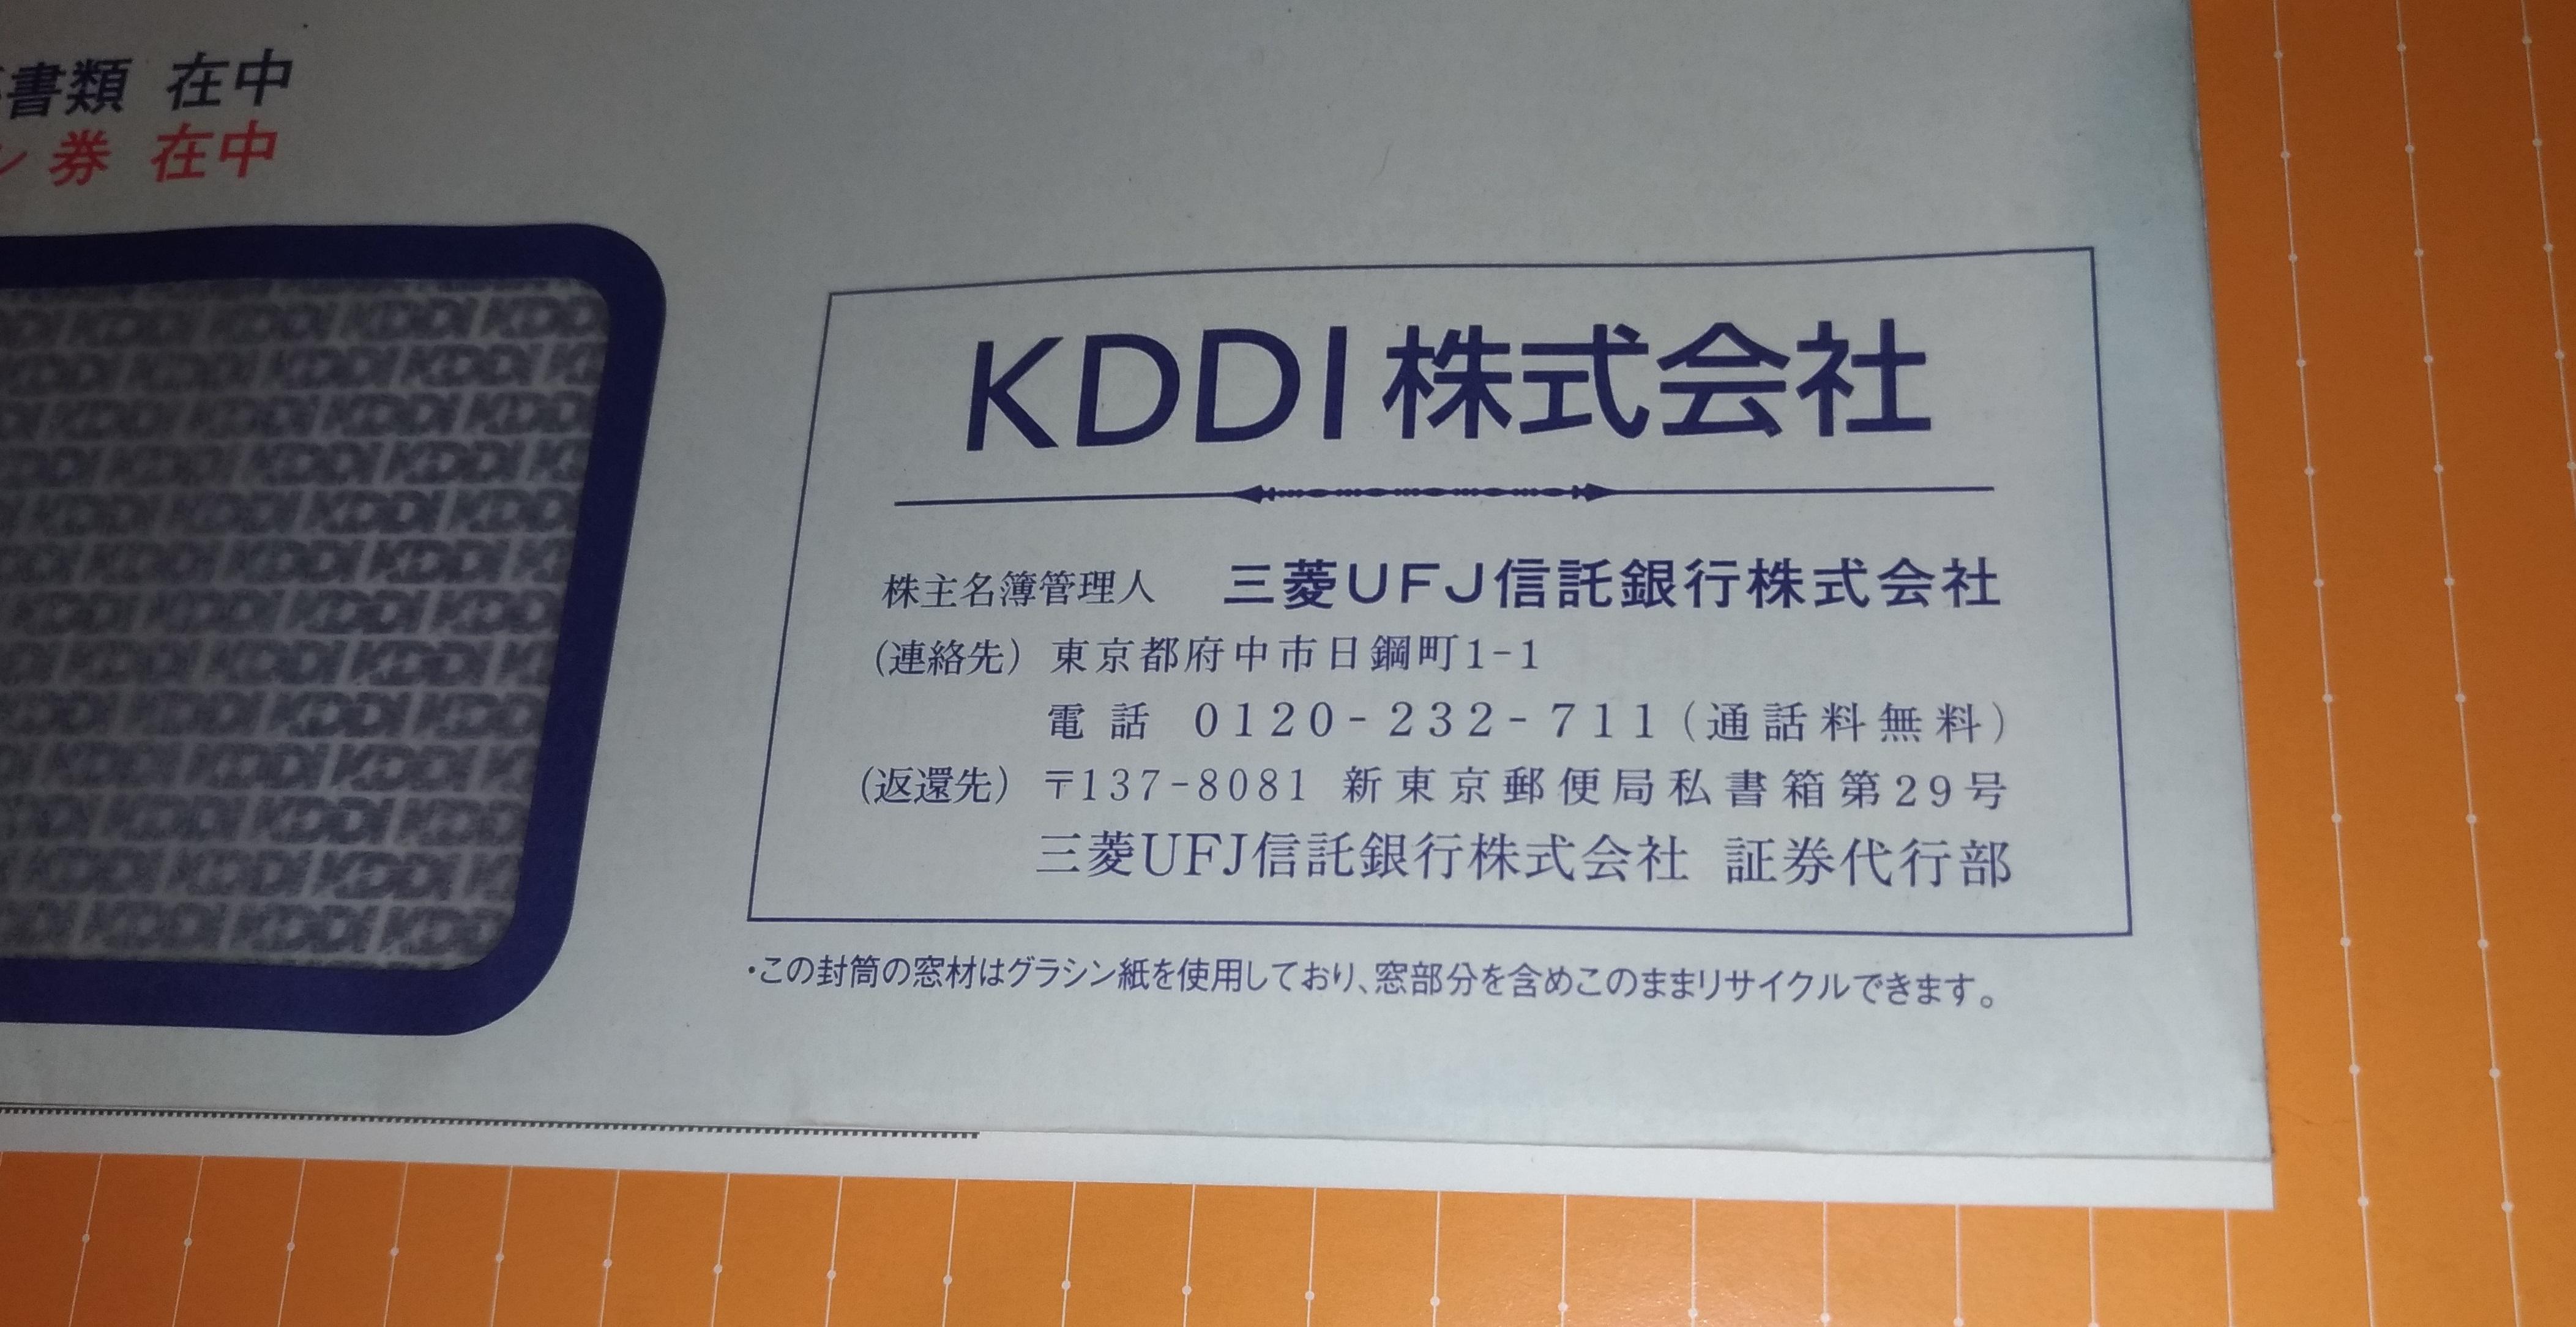 kddi_haito_2020_12_03.jpg